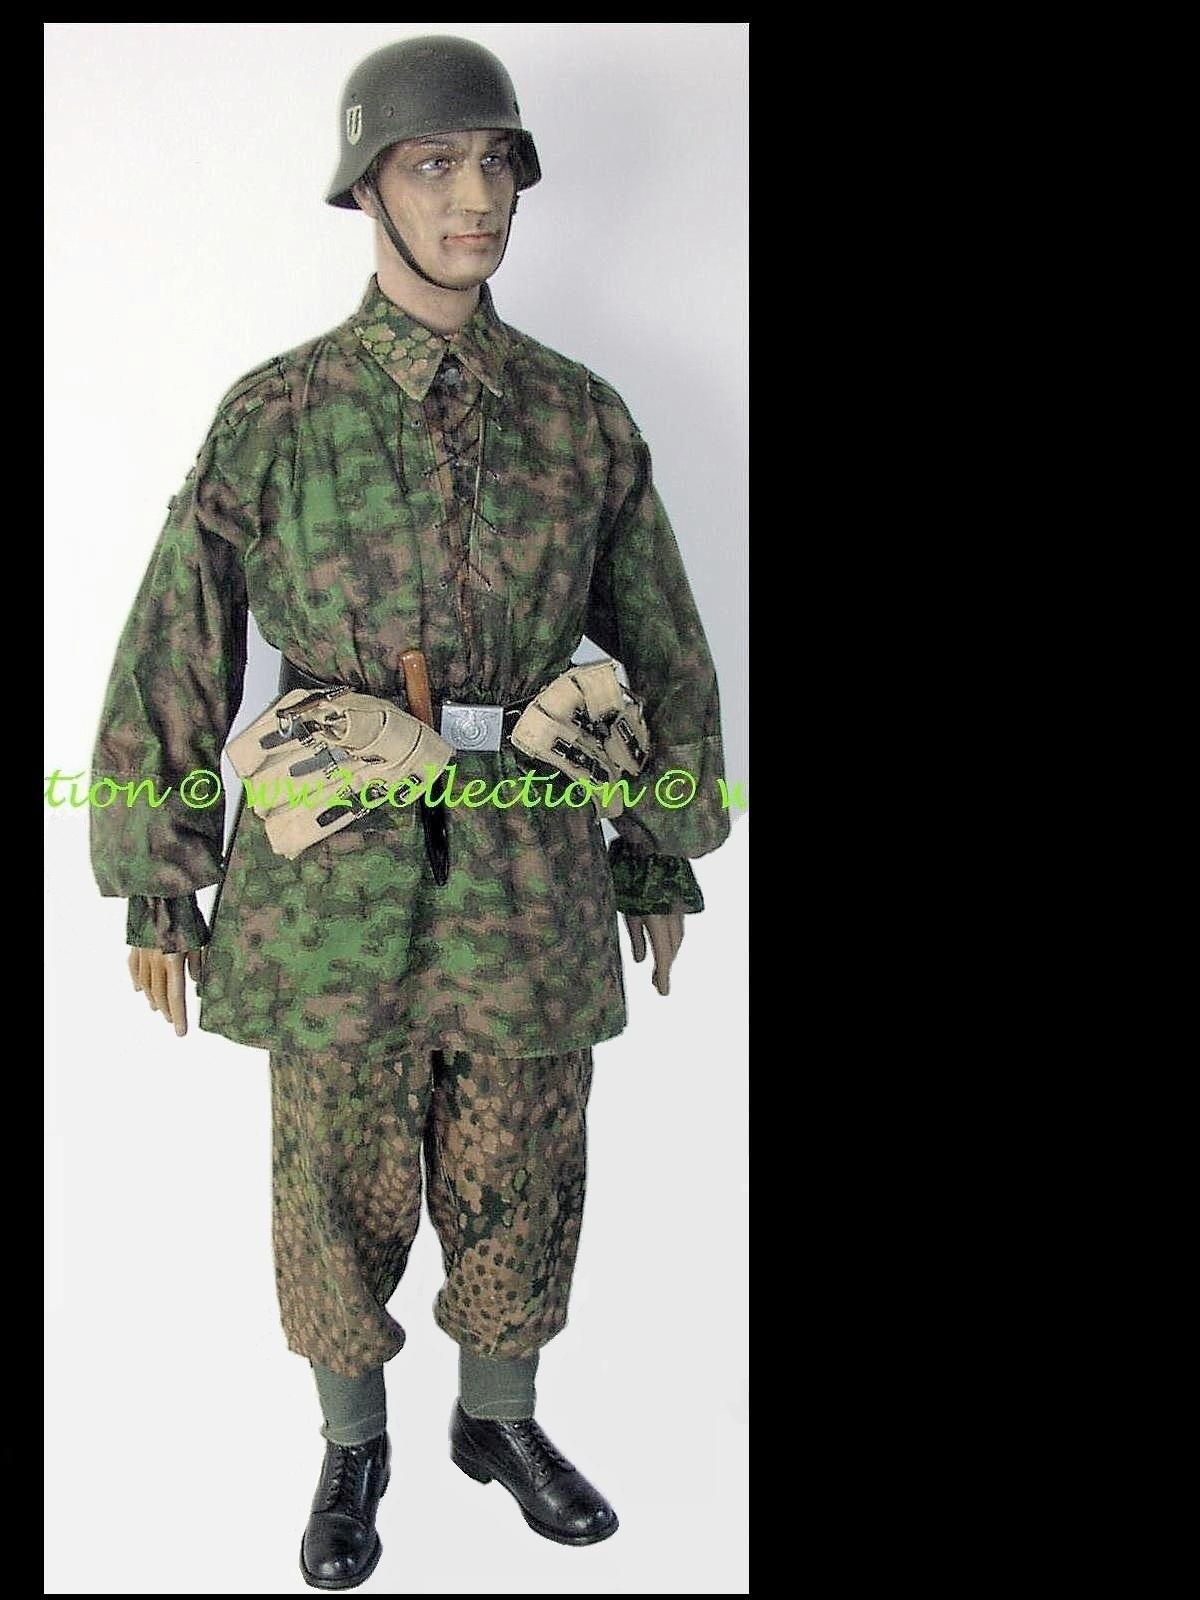 "Tarnhemd Waffen-SS Rauchtarnmuster, SD Waffen-SS Helmet M42 w.name ""SS-Untersturmführer Carl..."""